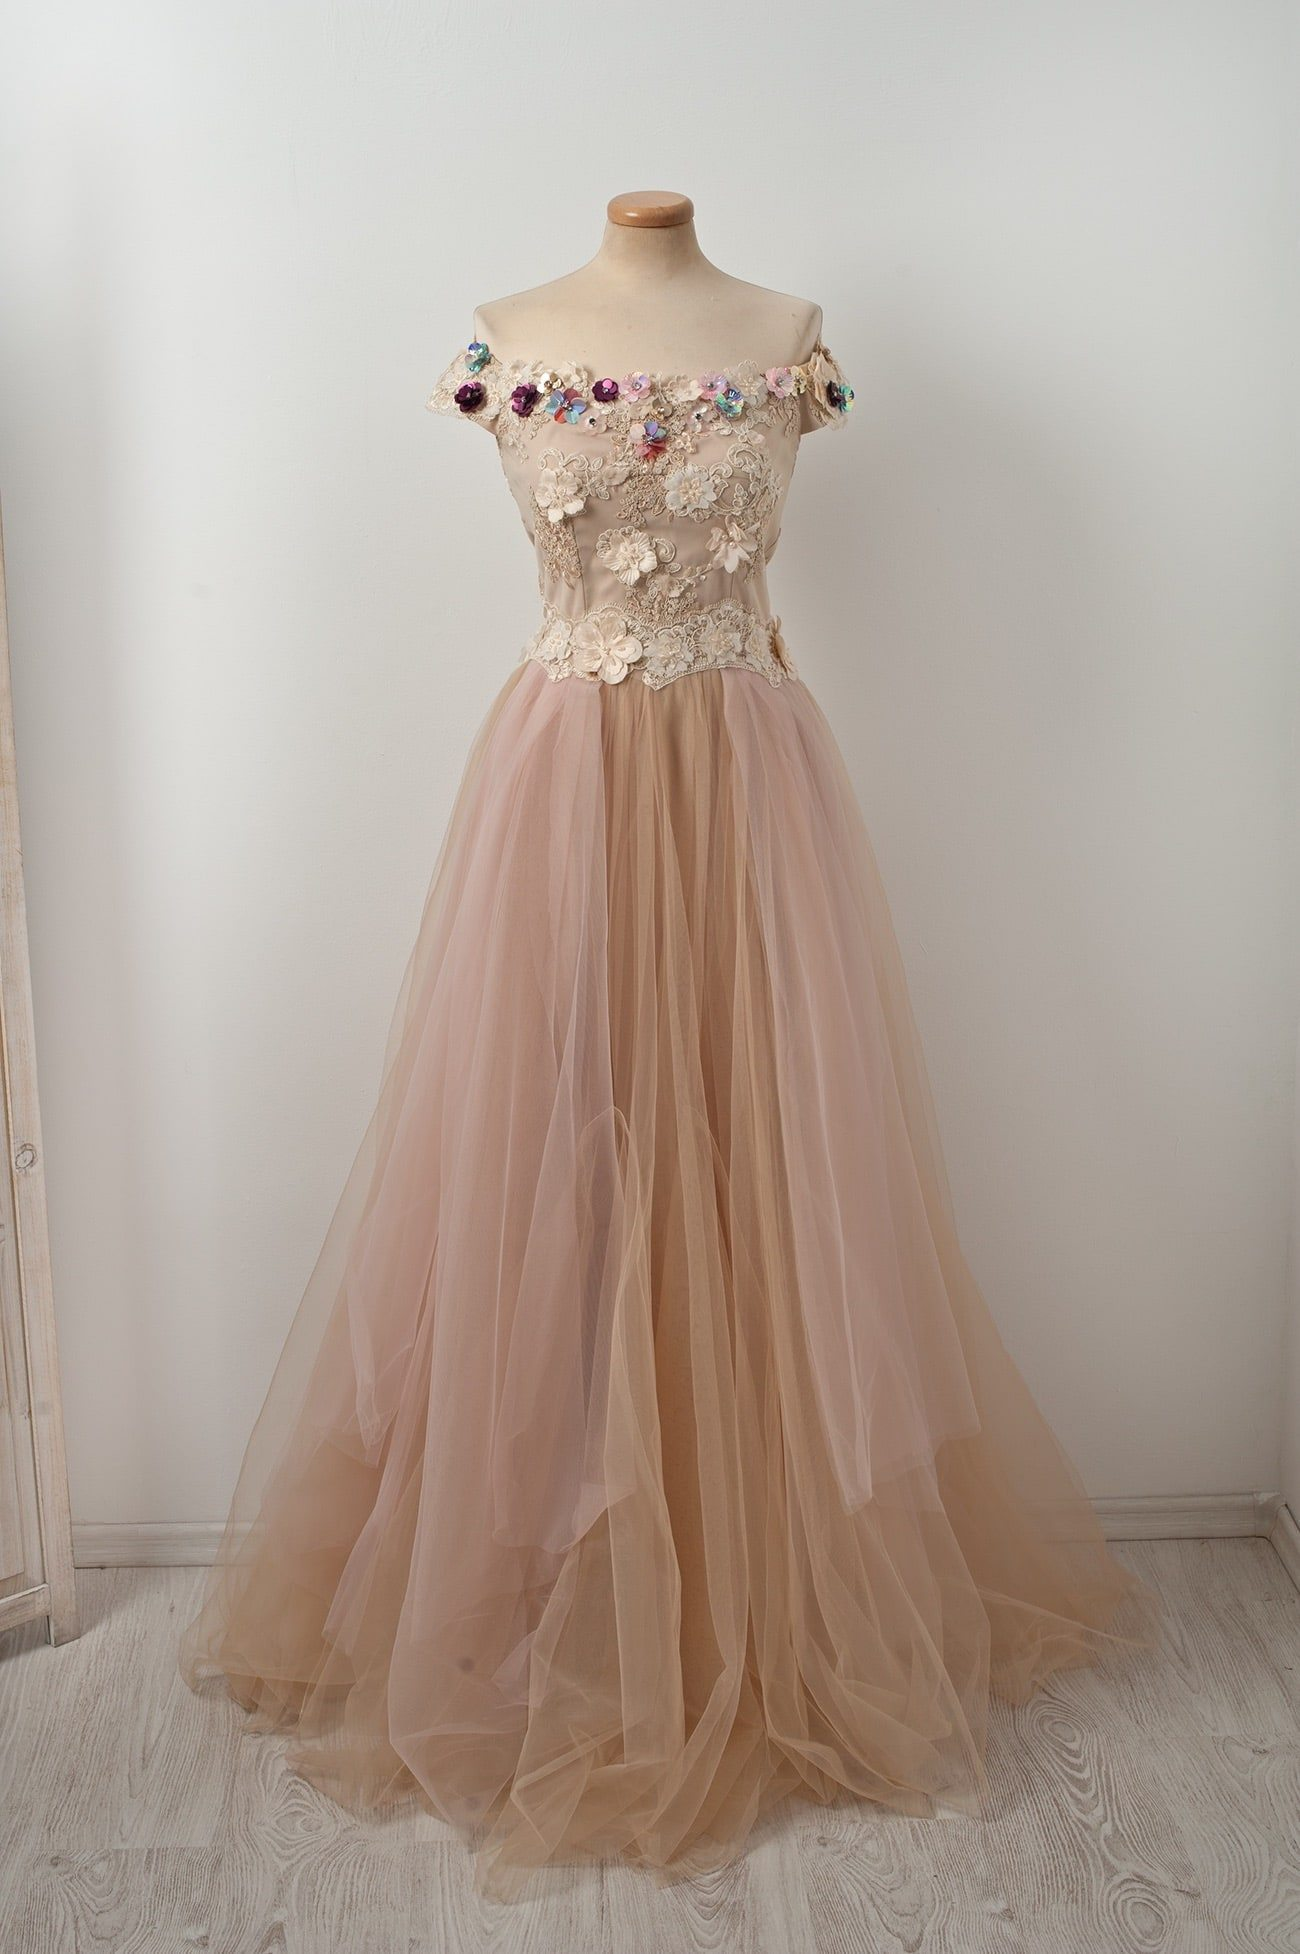 Off the shoulder corsetted tulle Chotronette Caramel aux Amandes dress